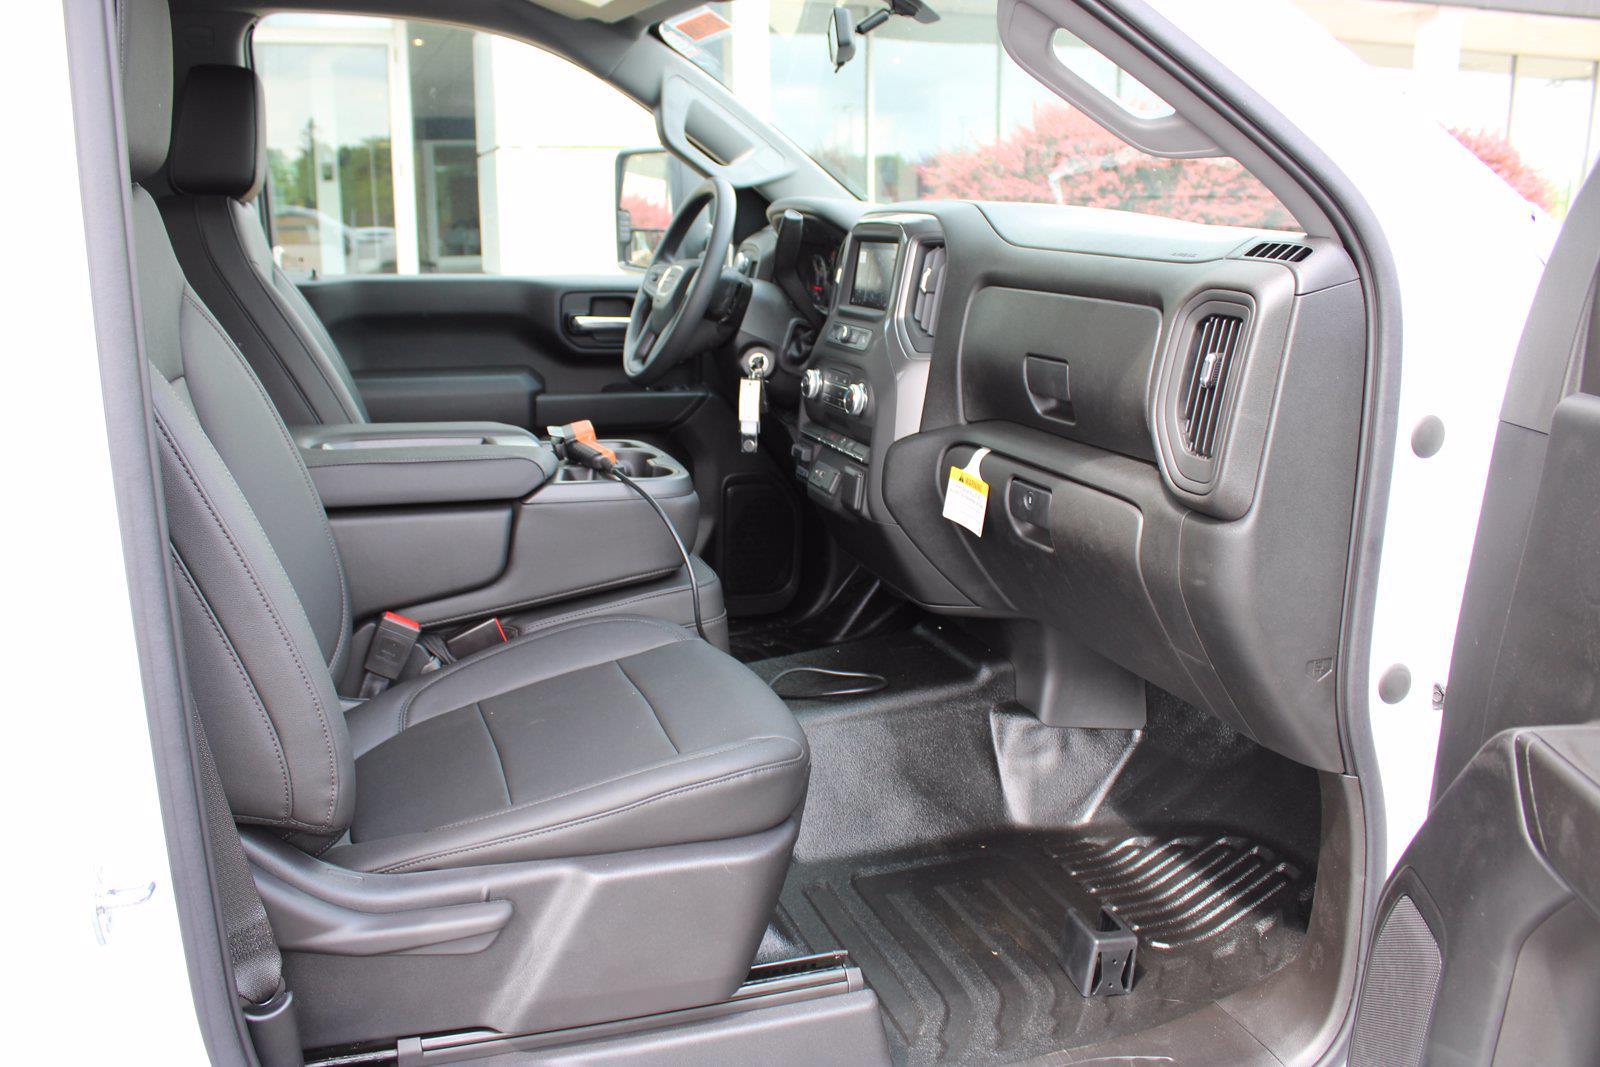 2021 GMC Sierra 3500 Regular Cab 4x4, Dump Body #P21-1004 - photo 15